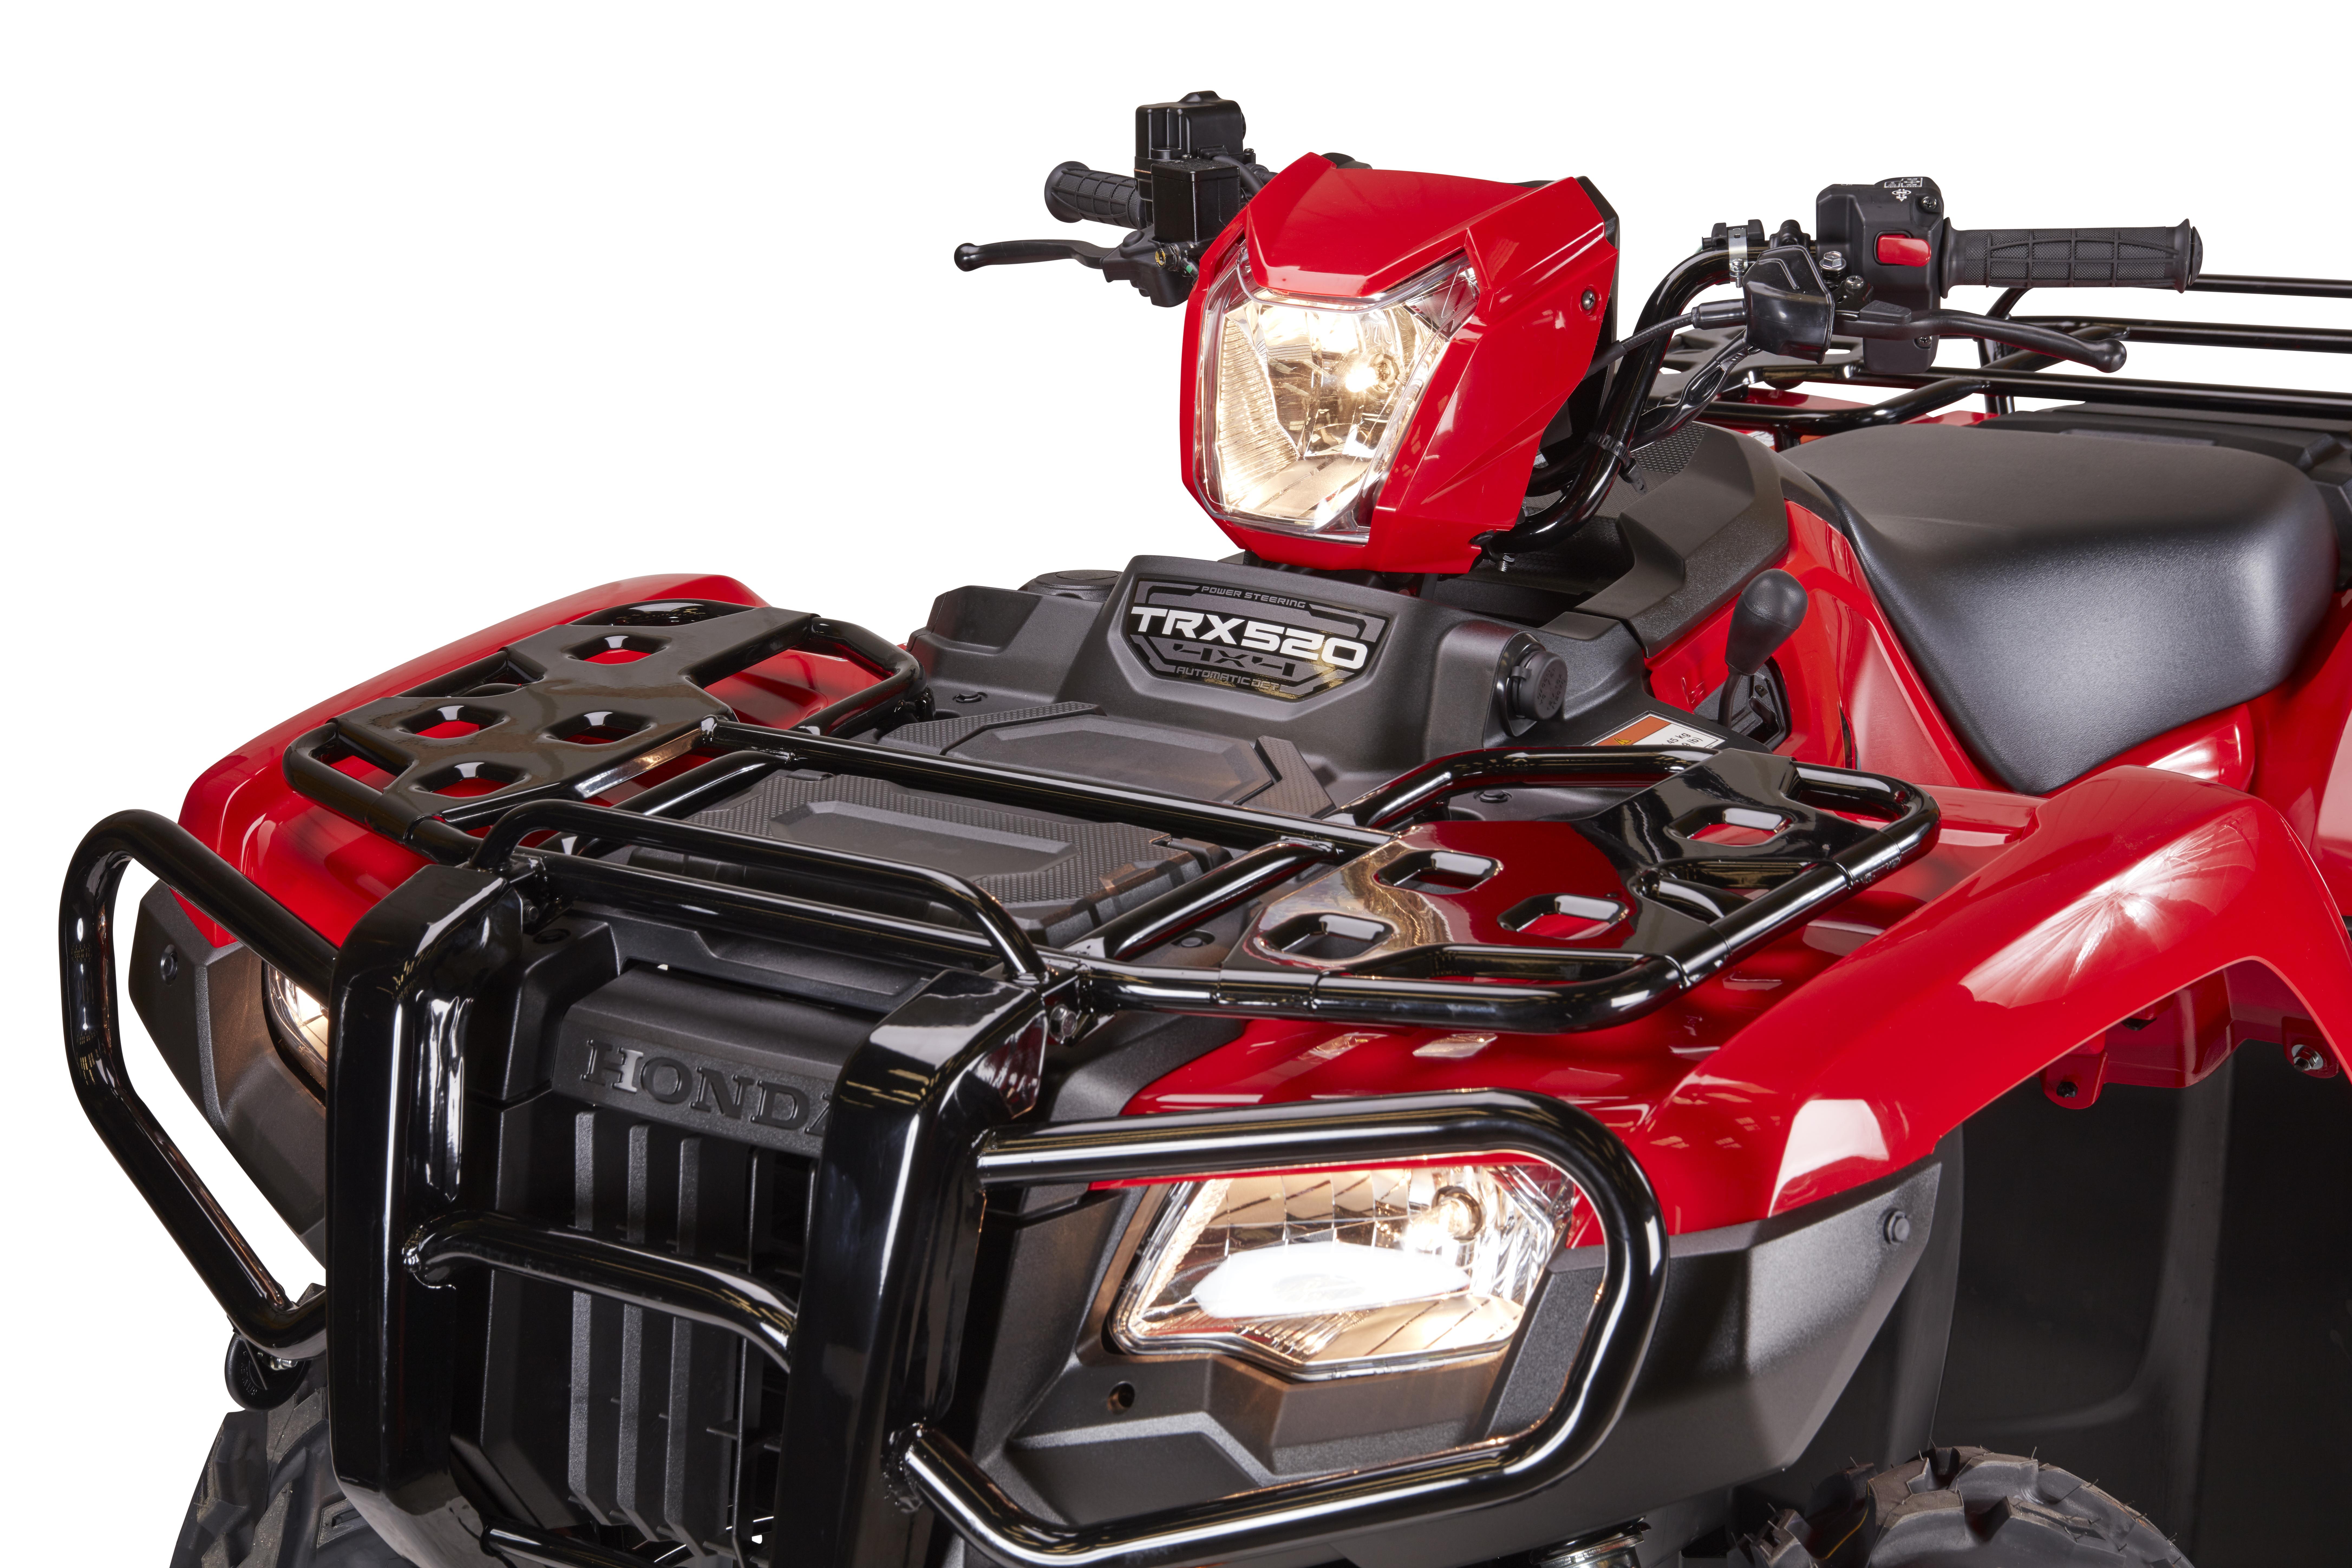 Image of 2020 Foreman 520 Auto